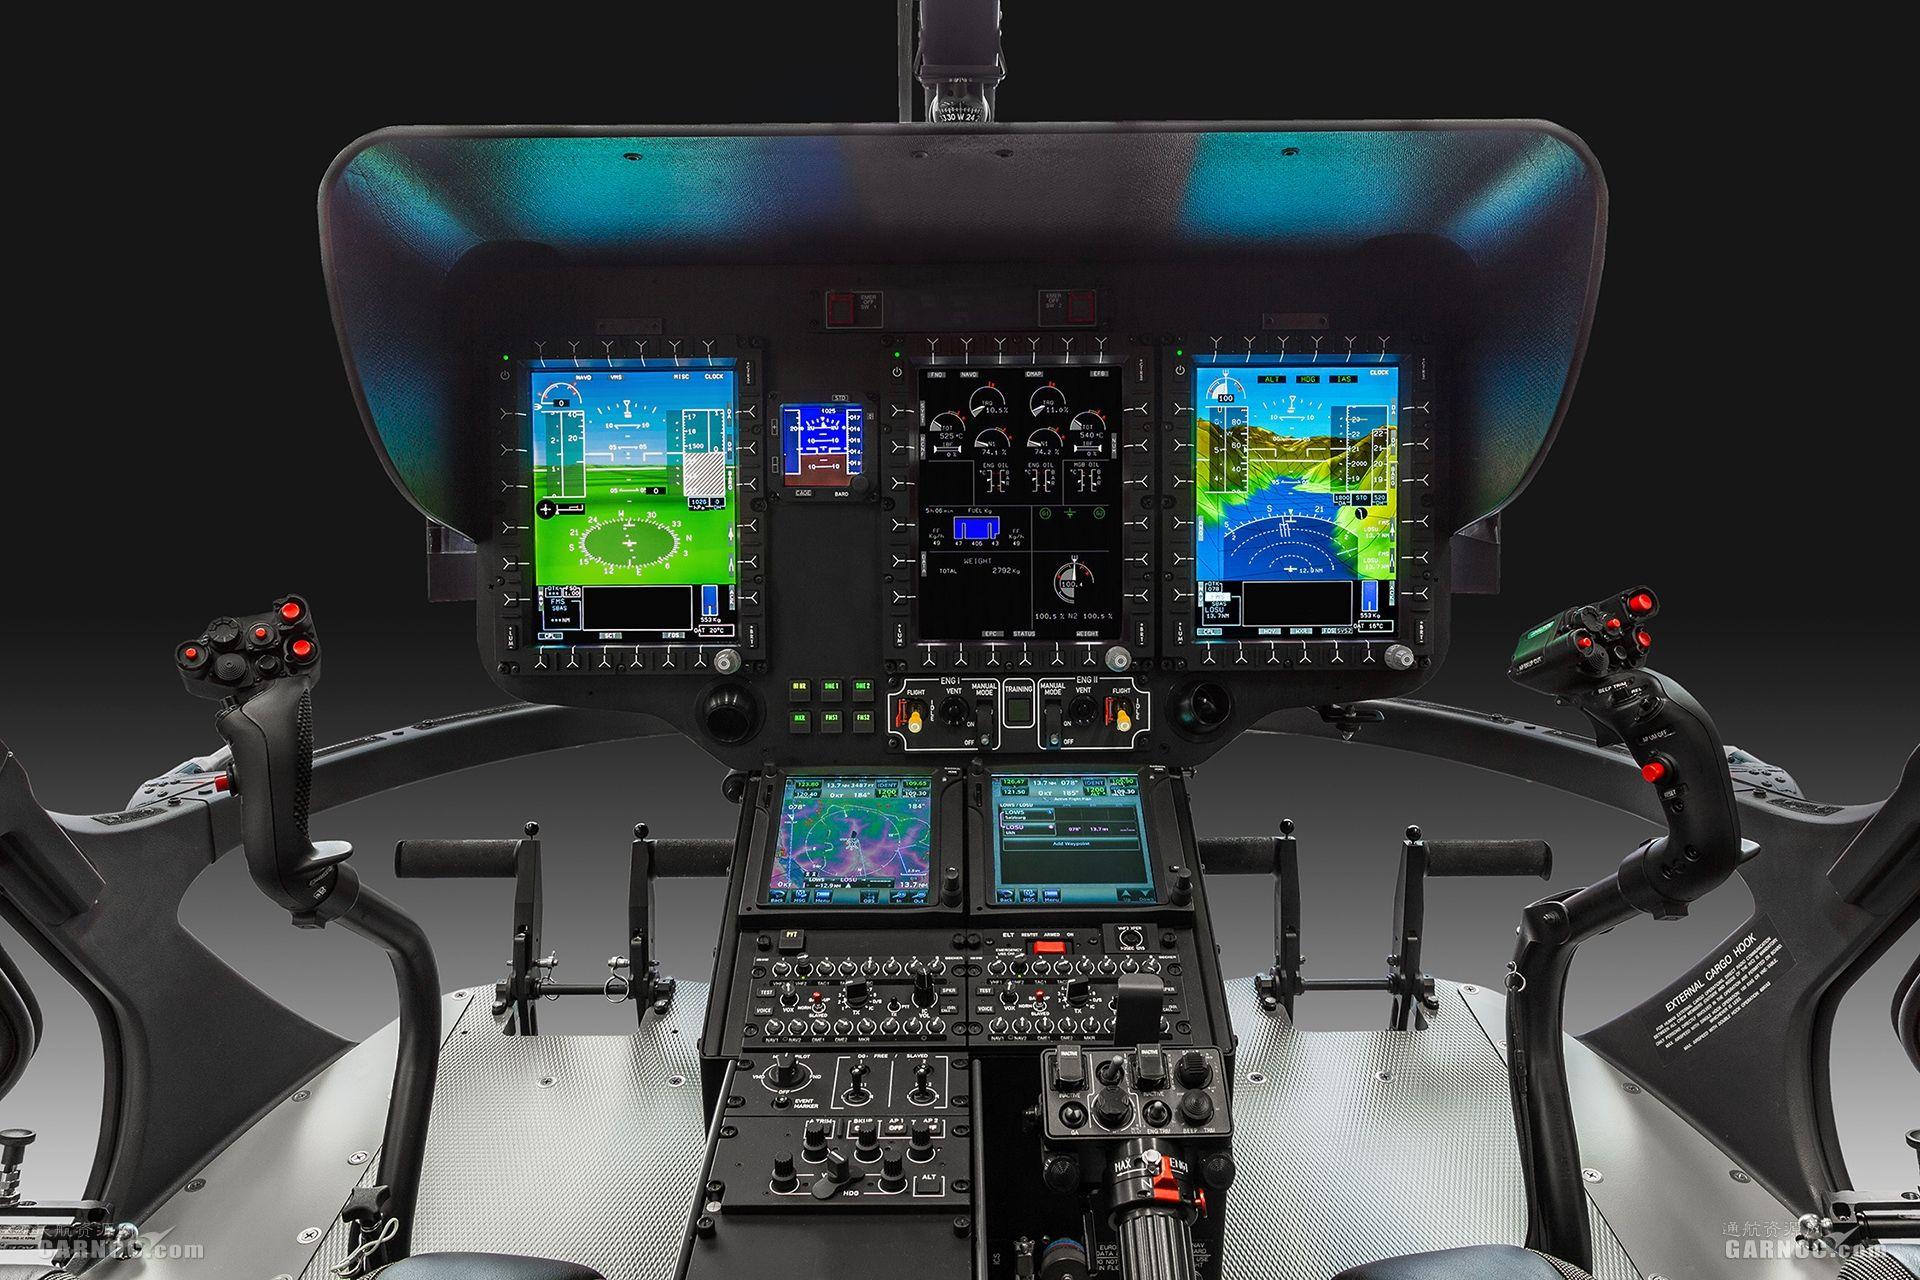 H145直升机进一步提升竞争力和运营能力